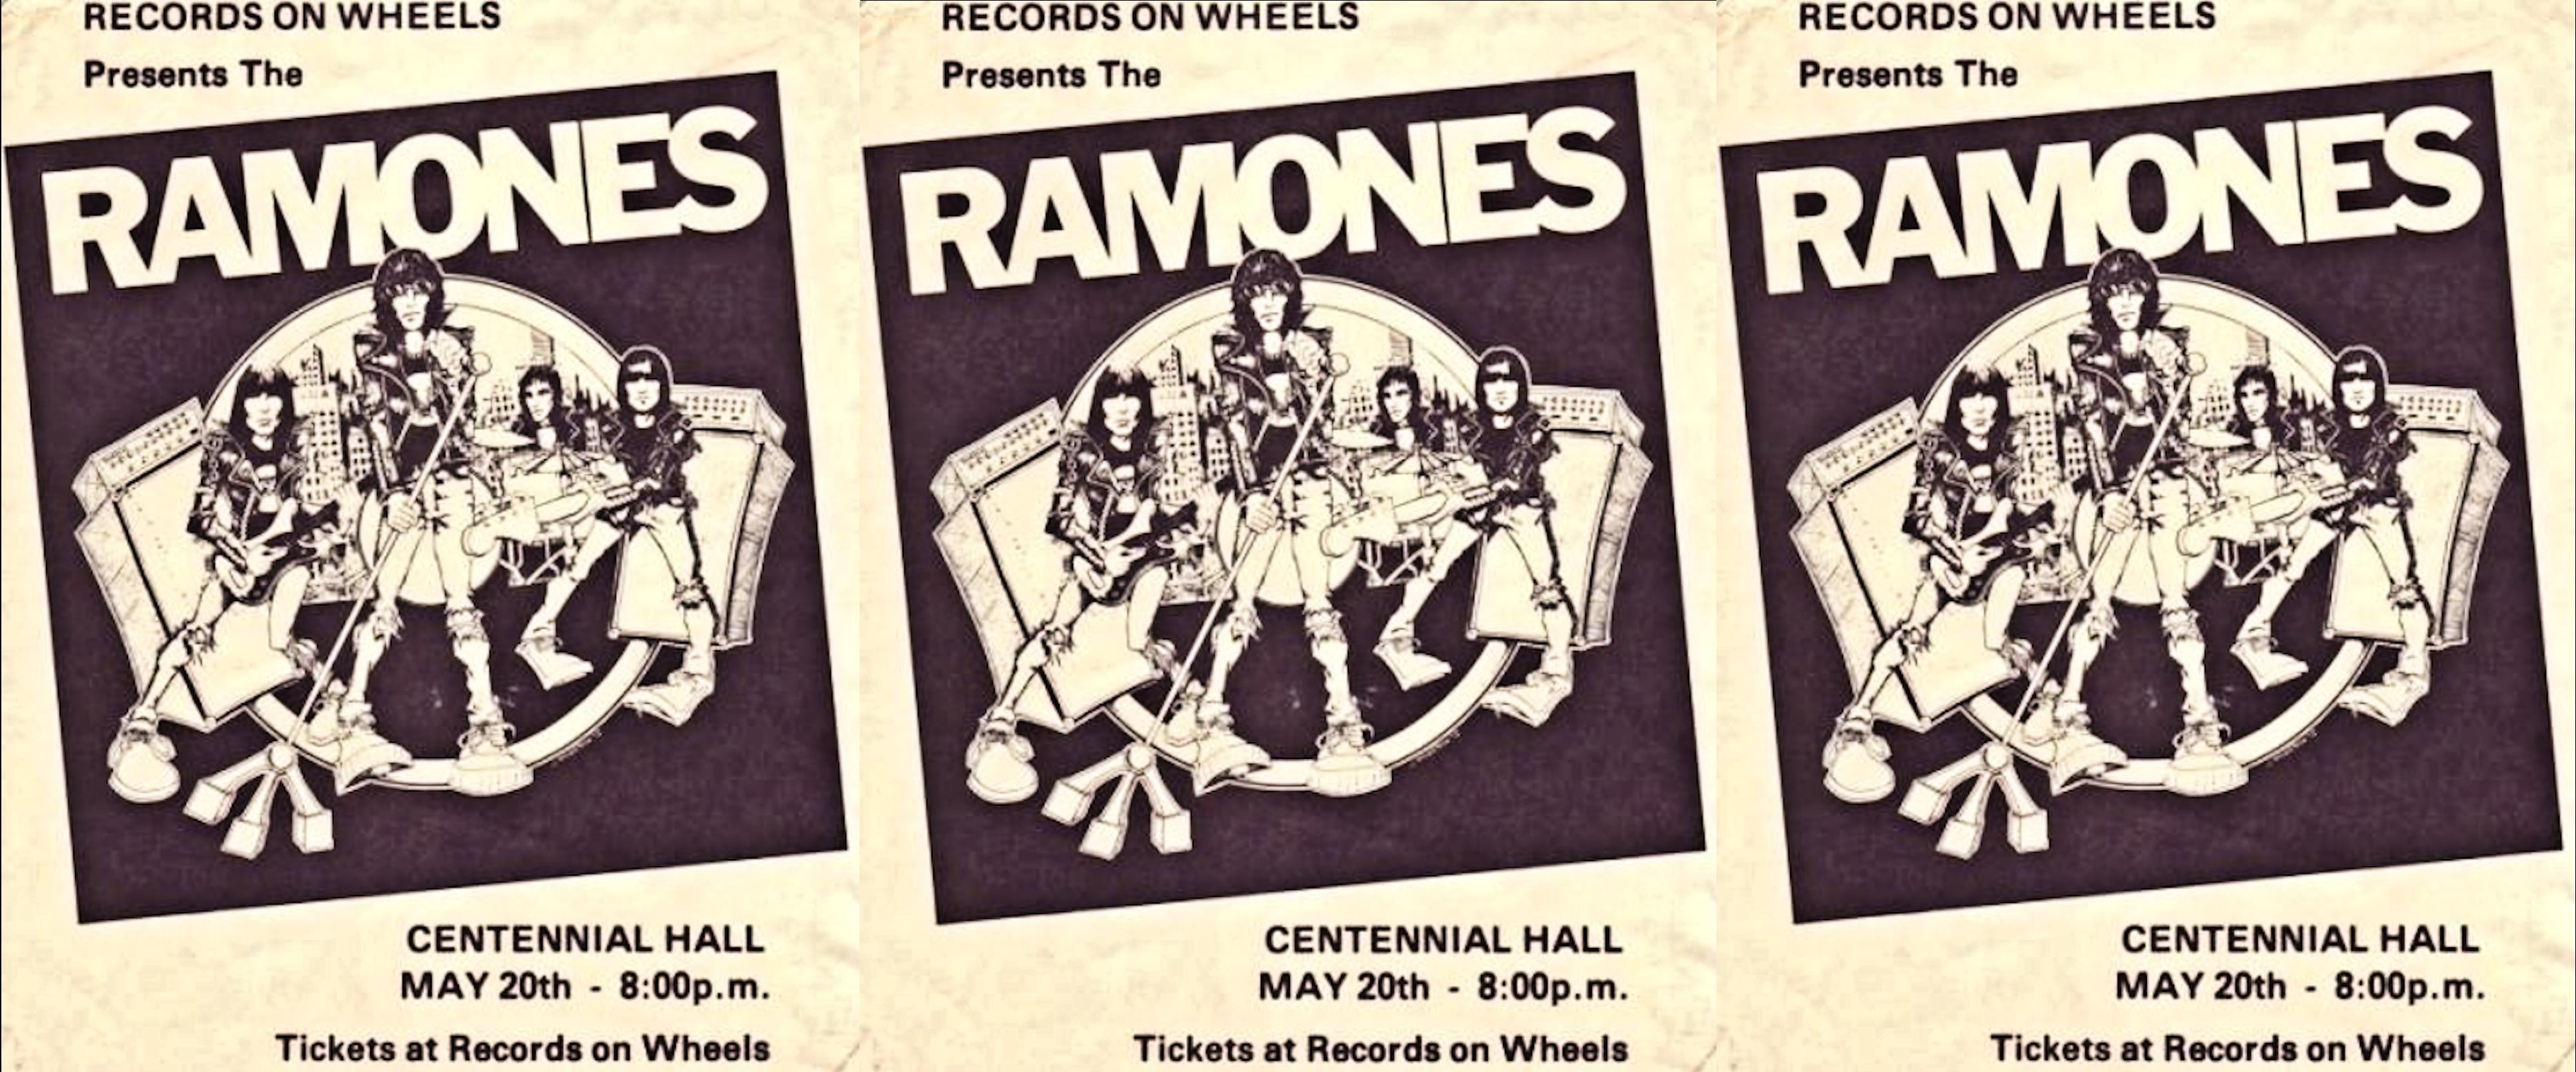 Ramones with the Demics, Centennial Hall, London, Ontario, Canada, May 20, 1980, Handbill, mylifeinconcert.com, Episode 3, Concert Number 7